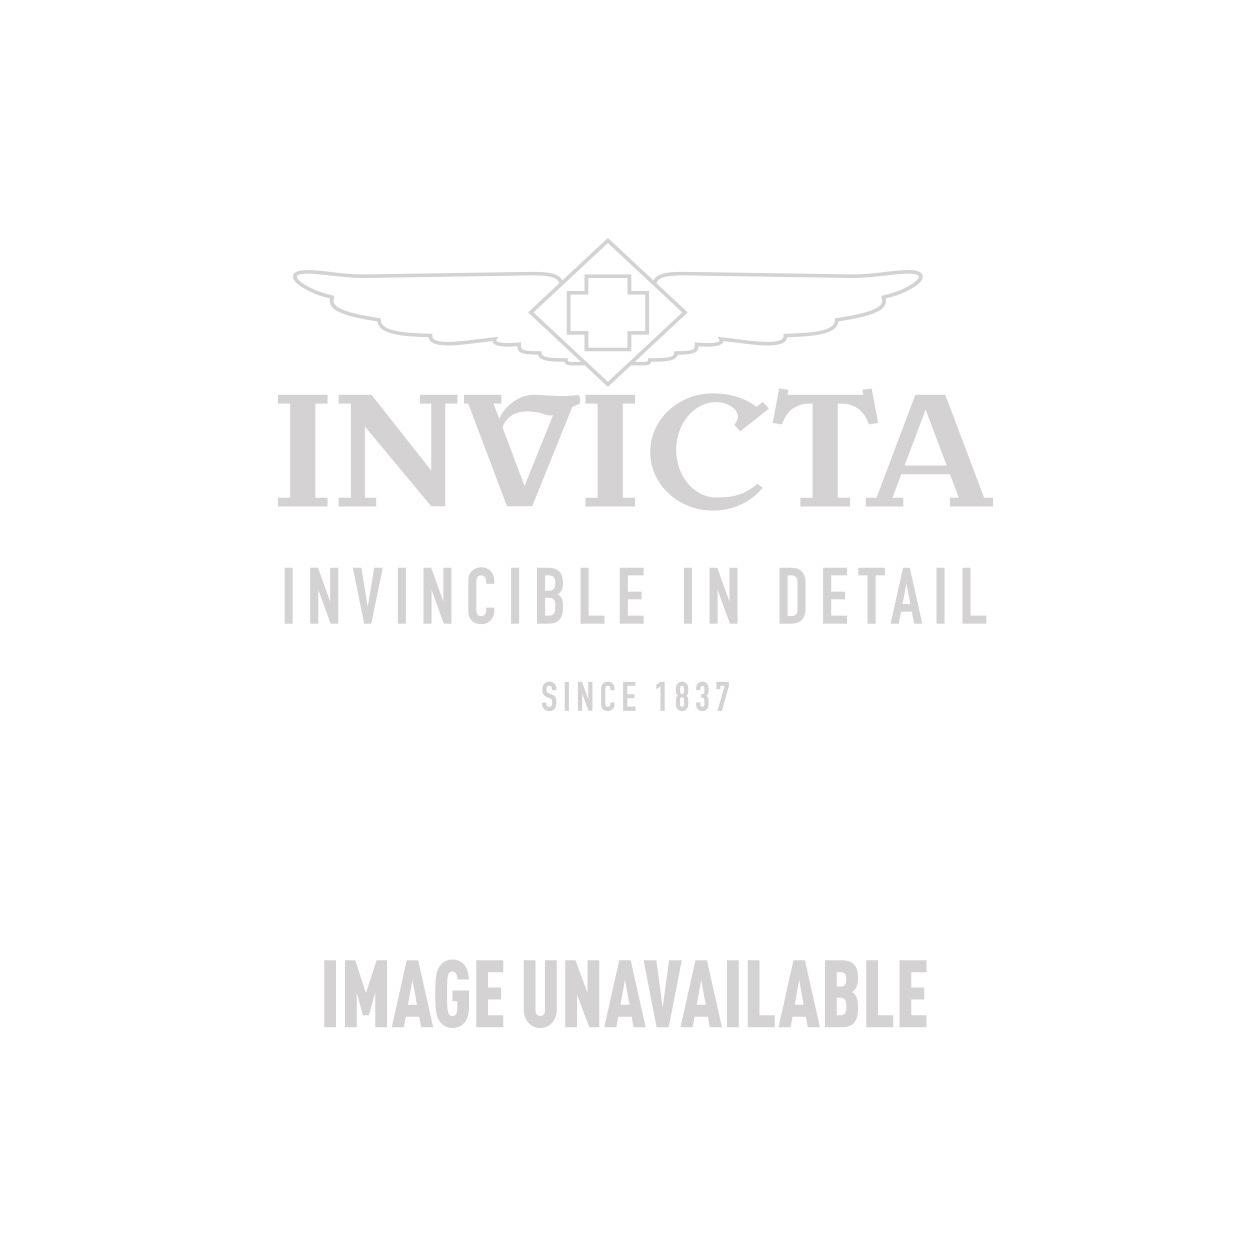 Invicta DNA Mens Quartz 46mm Stainless Steel Case Grey, Black, Blue Dial - Model 25057